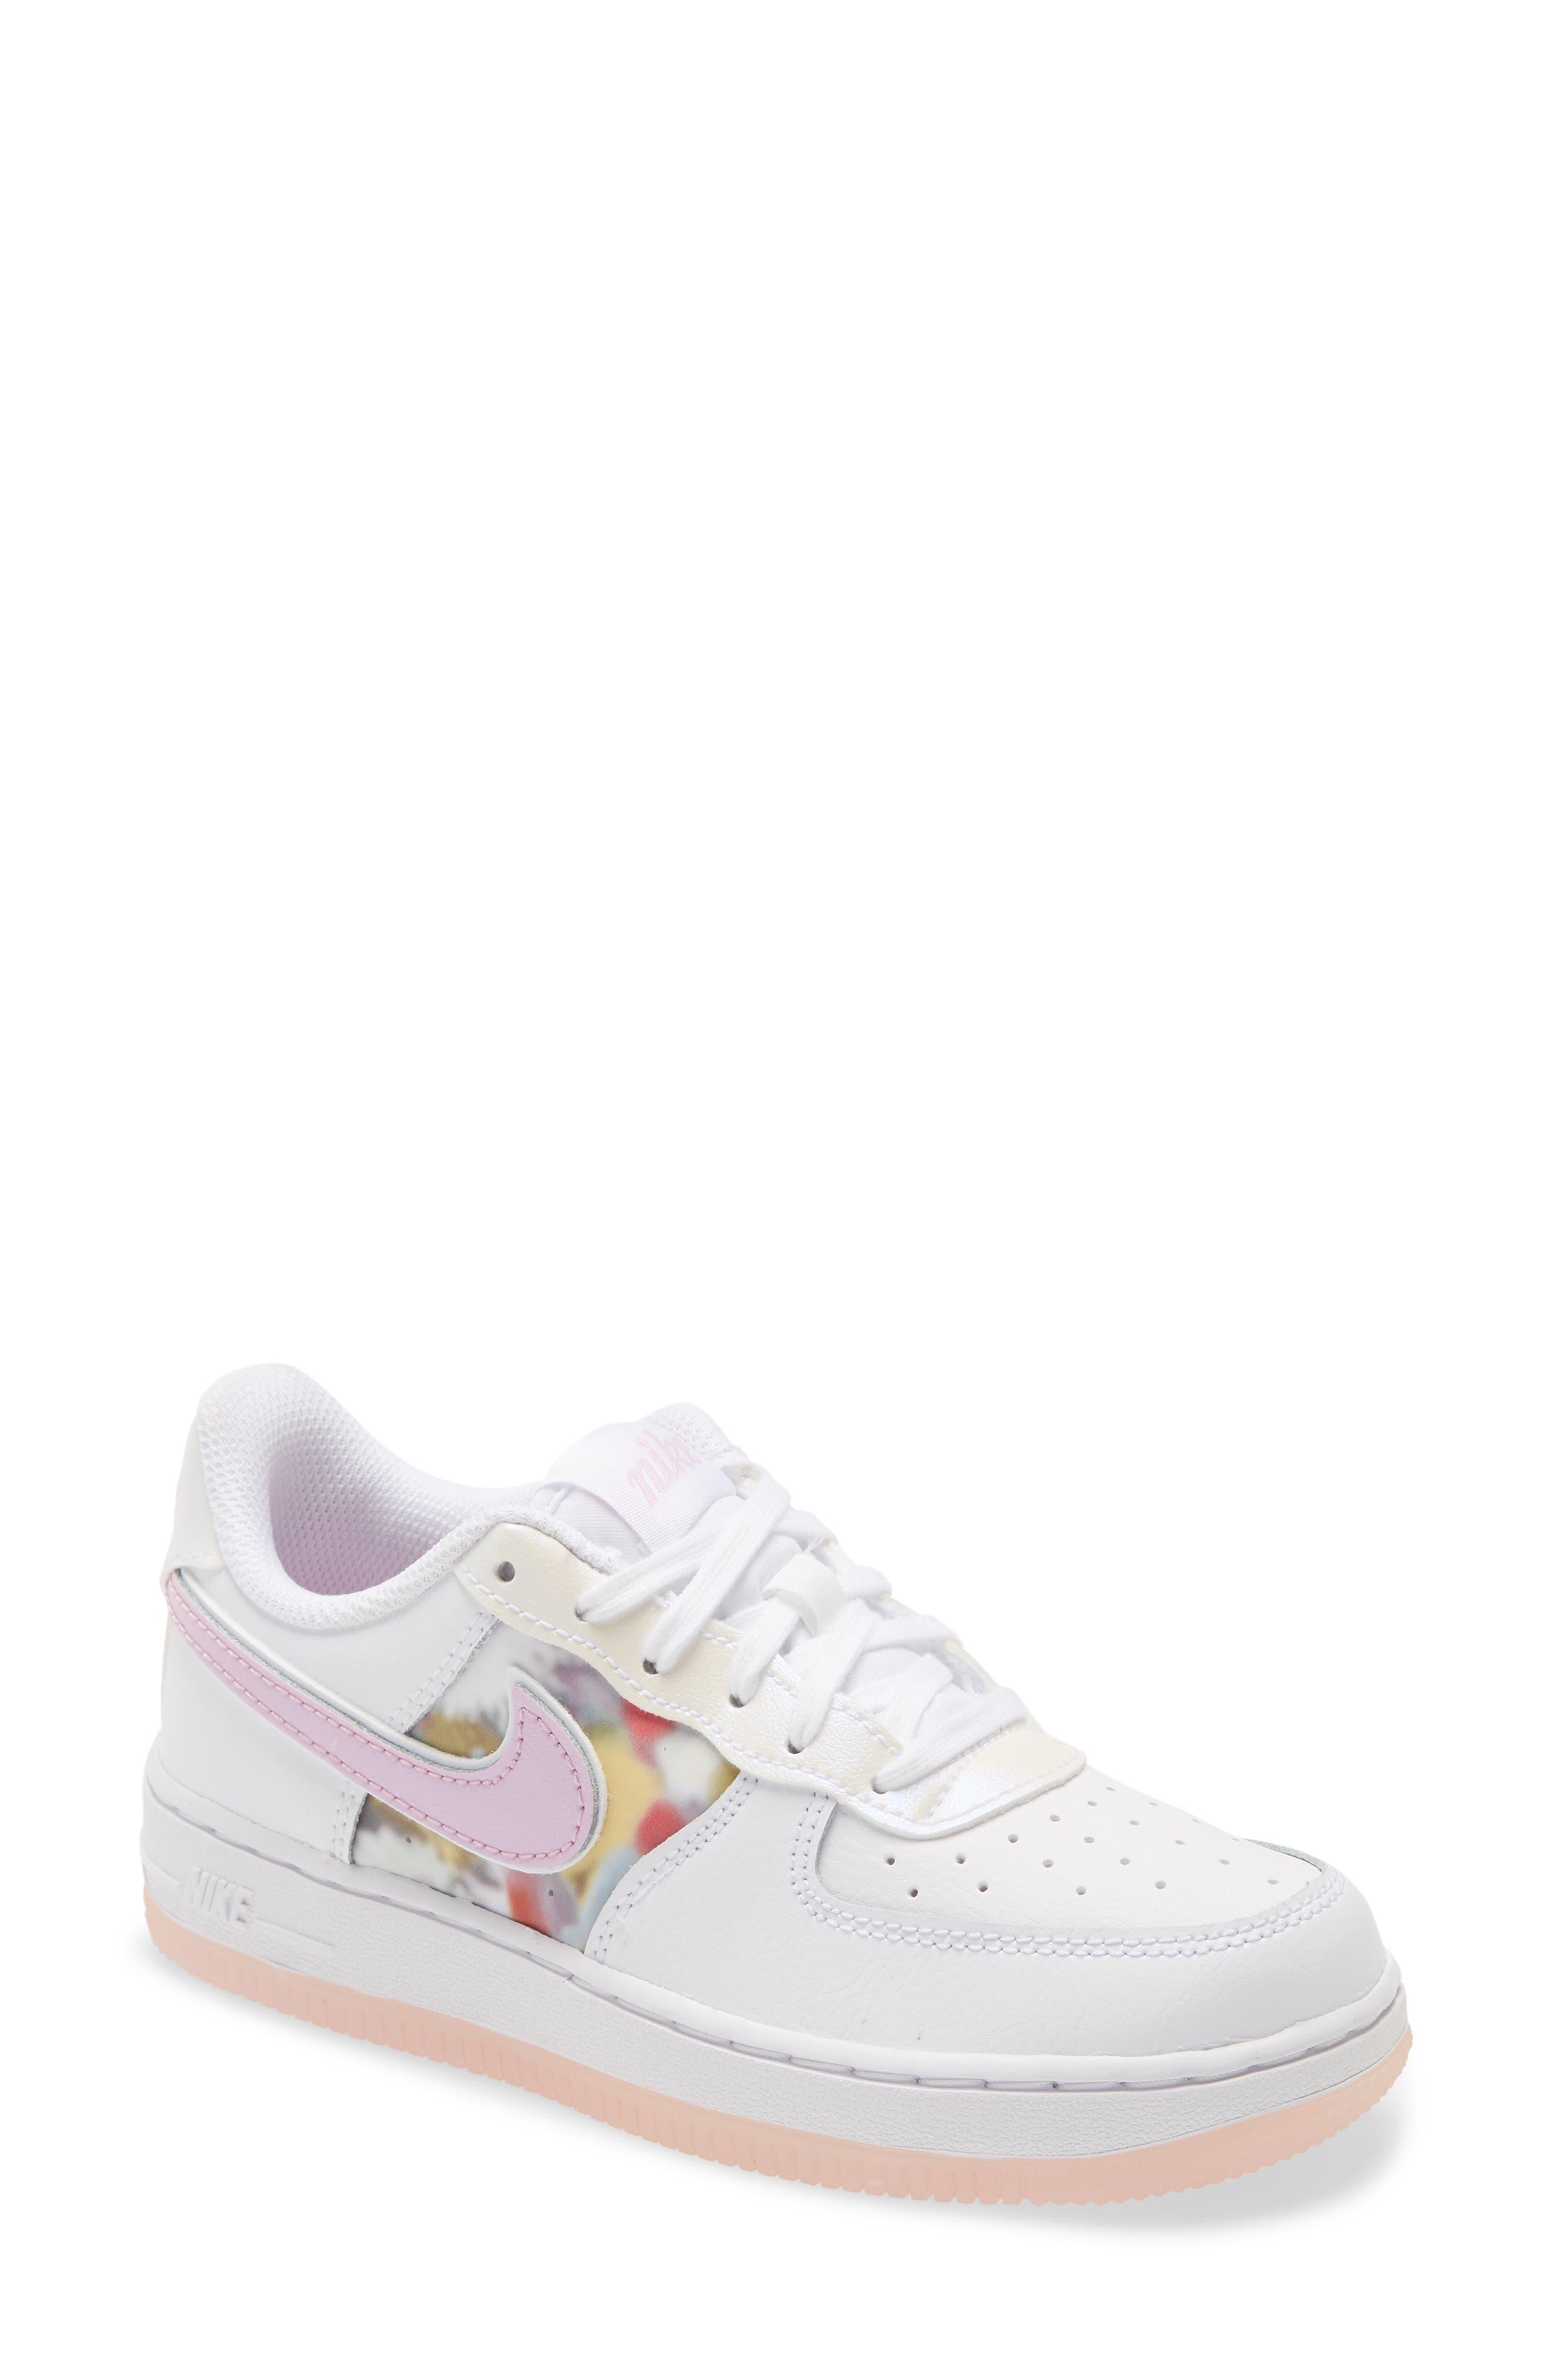 Nike Air Force 1 LV8 Sneaker (Toddler